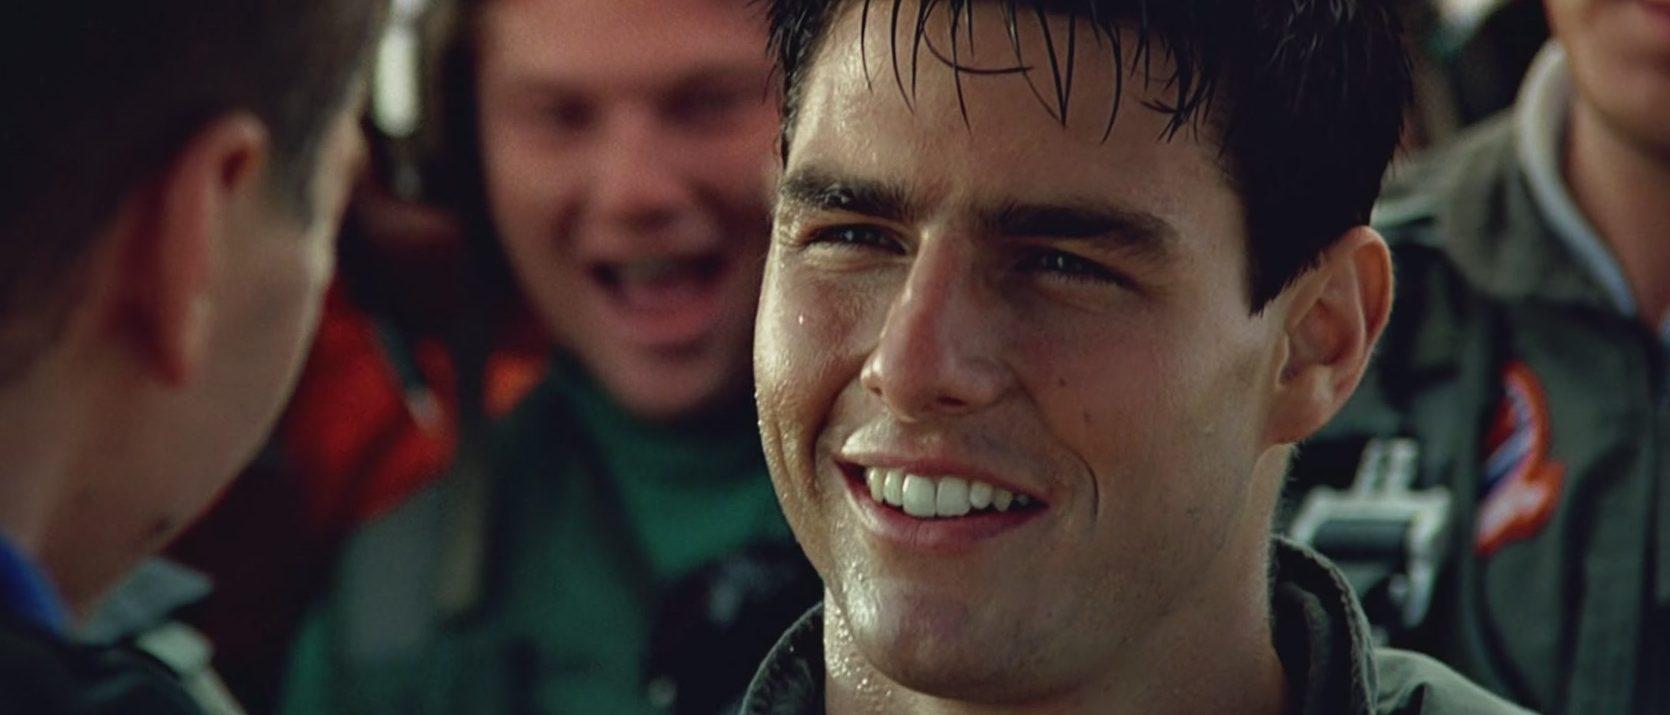 Top Gun Blu-Ray Screen Captures